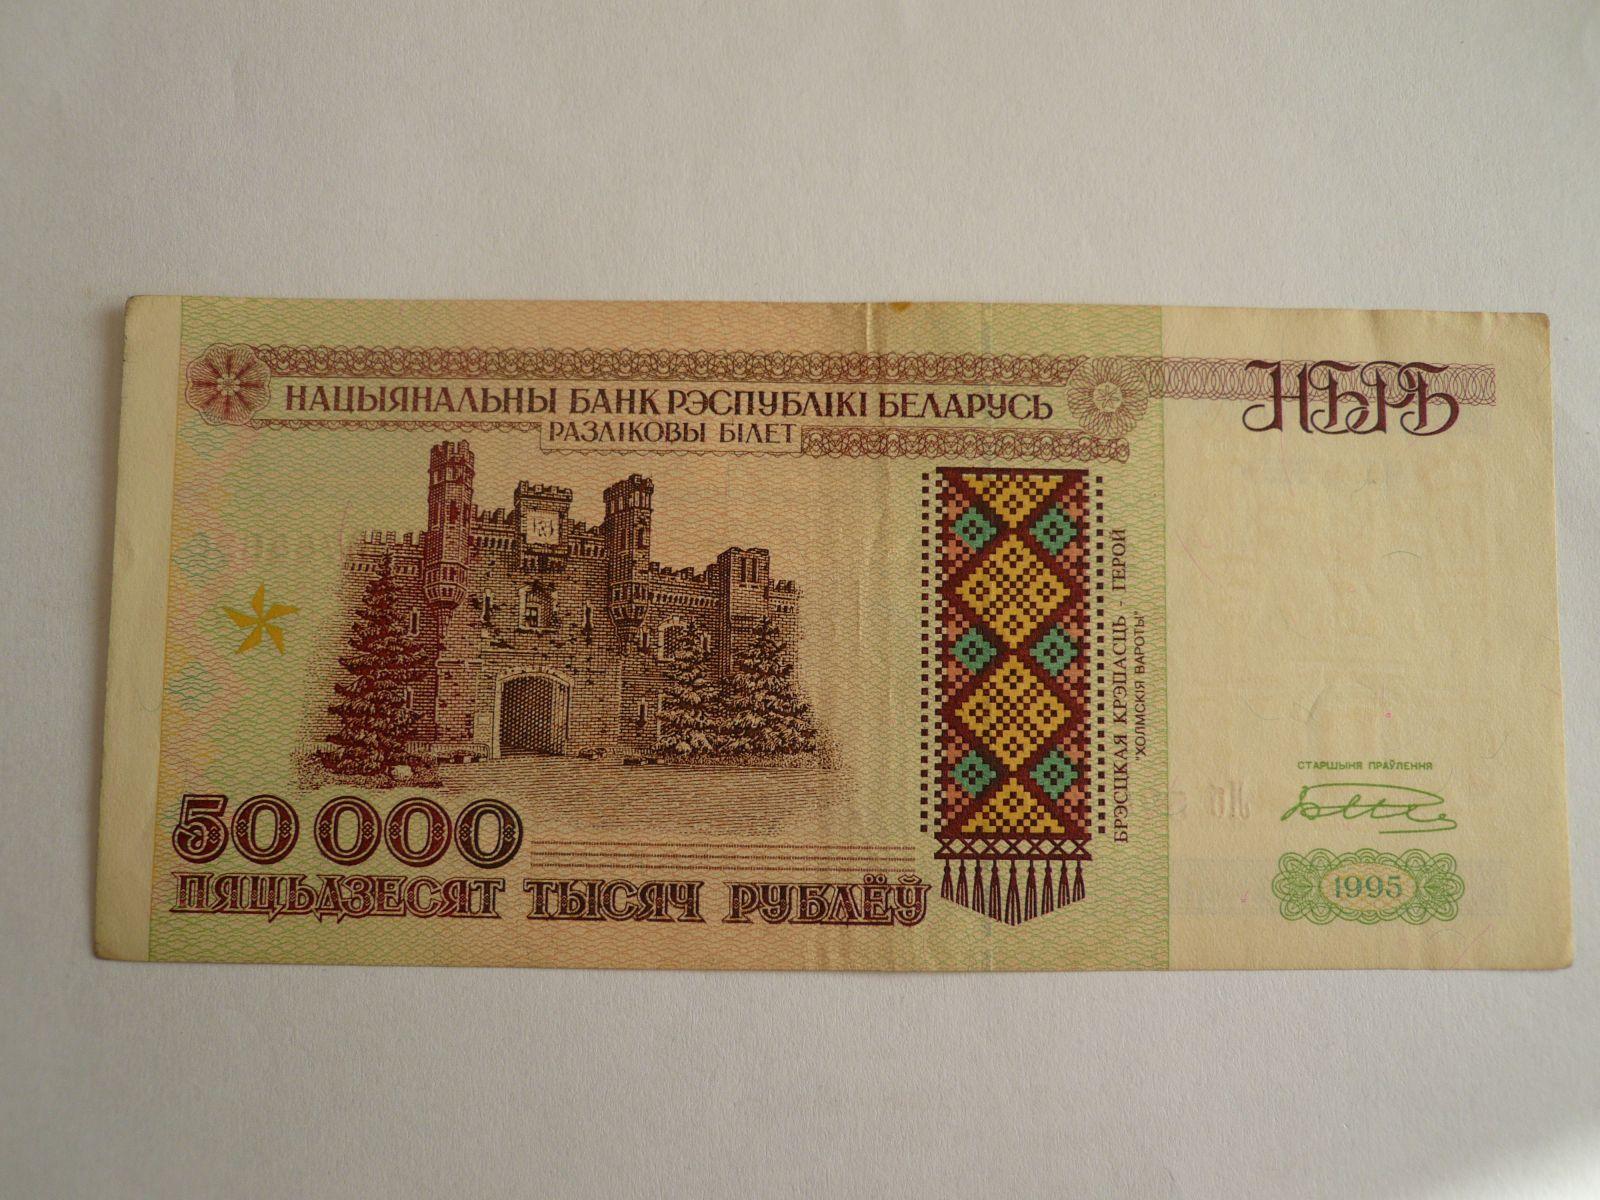 50000 Rublů,, Bělorusko, 1995